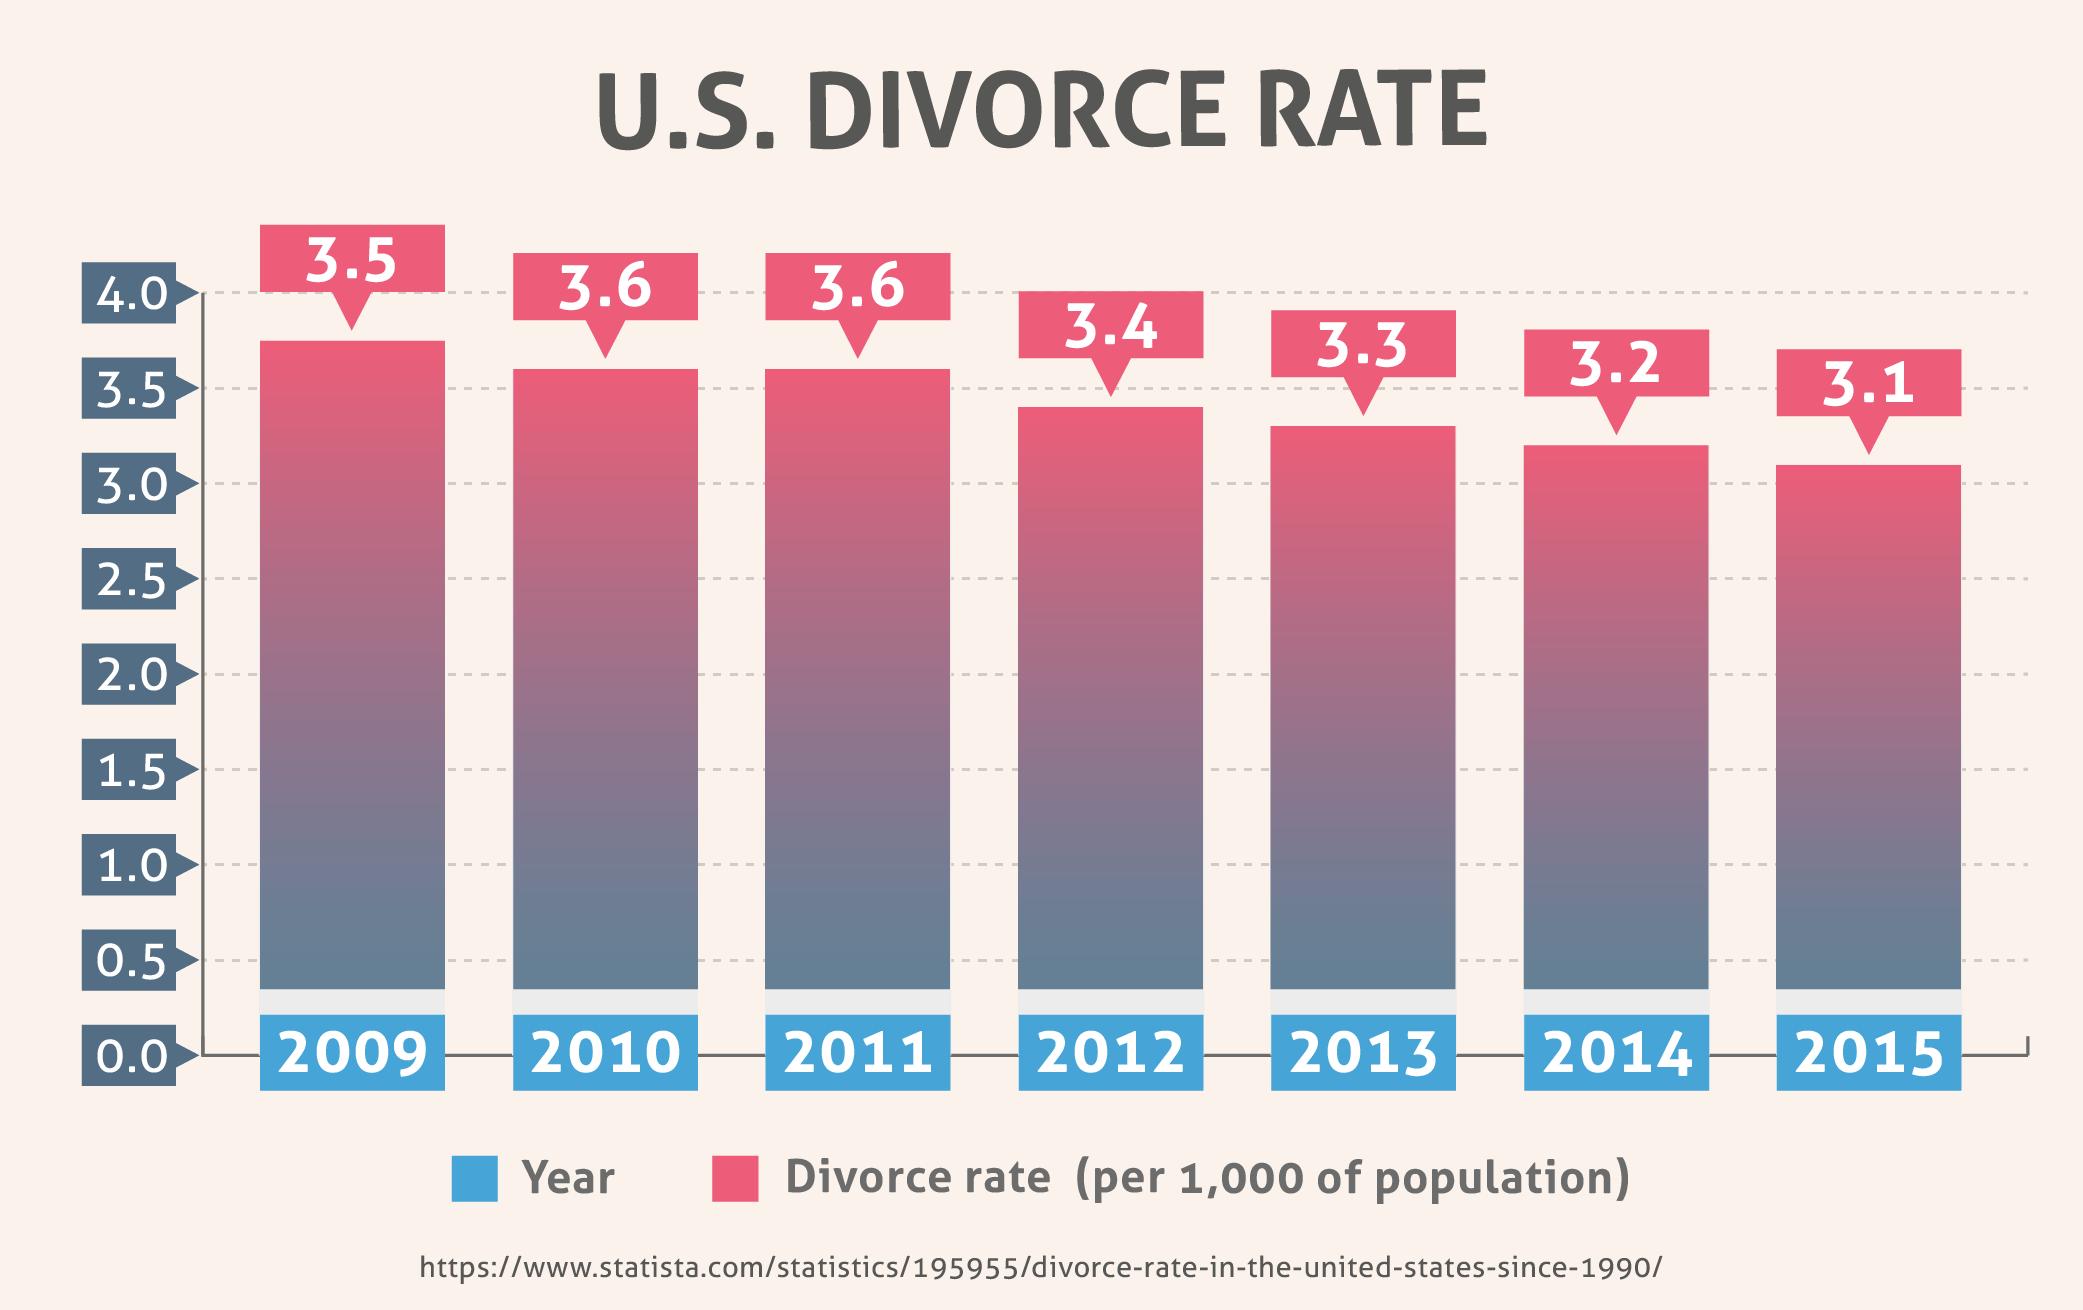 U.S. Divorce Rate